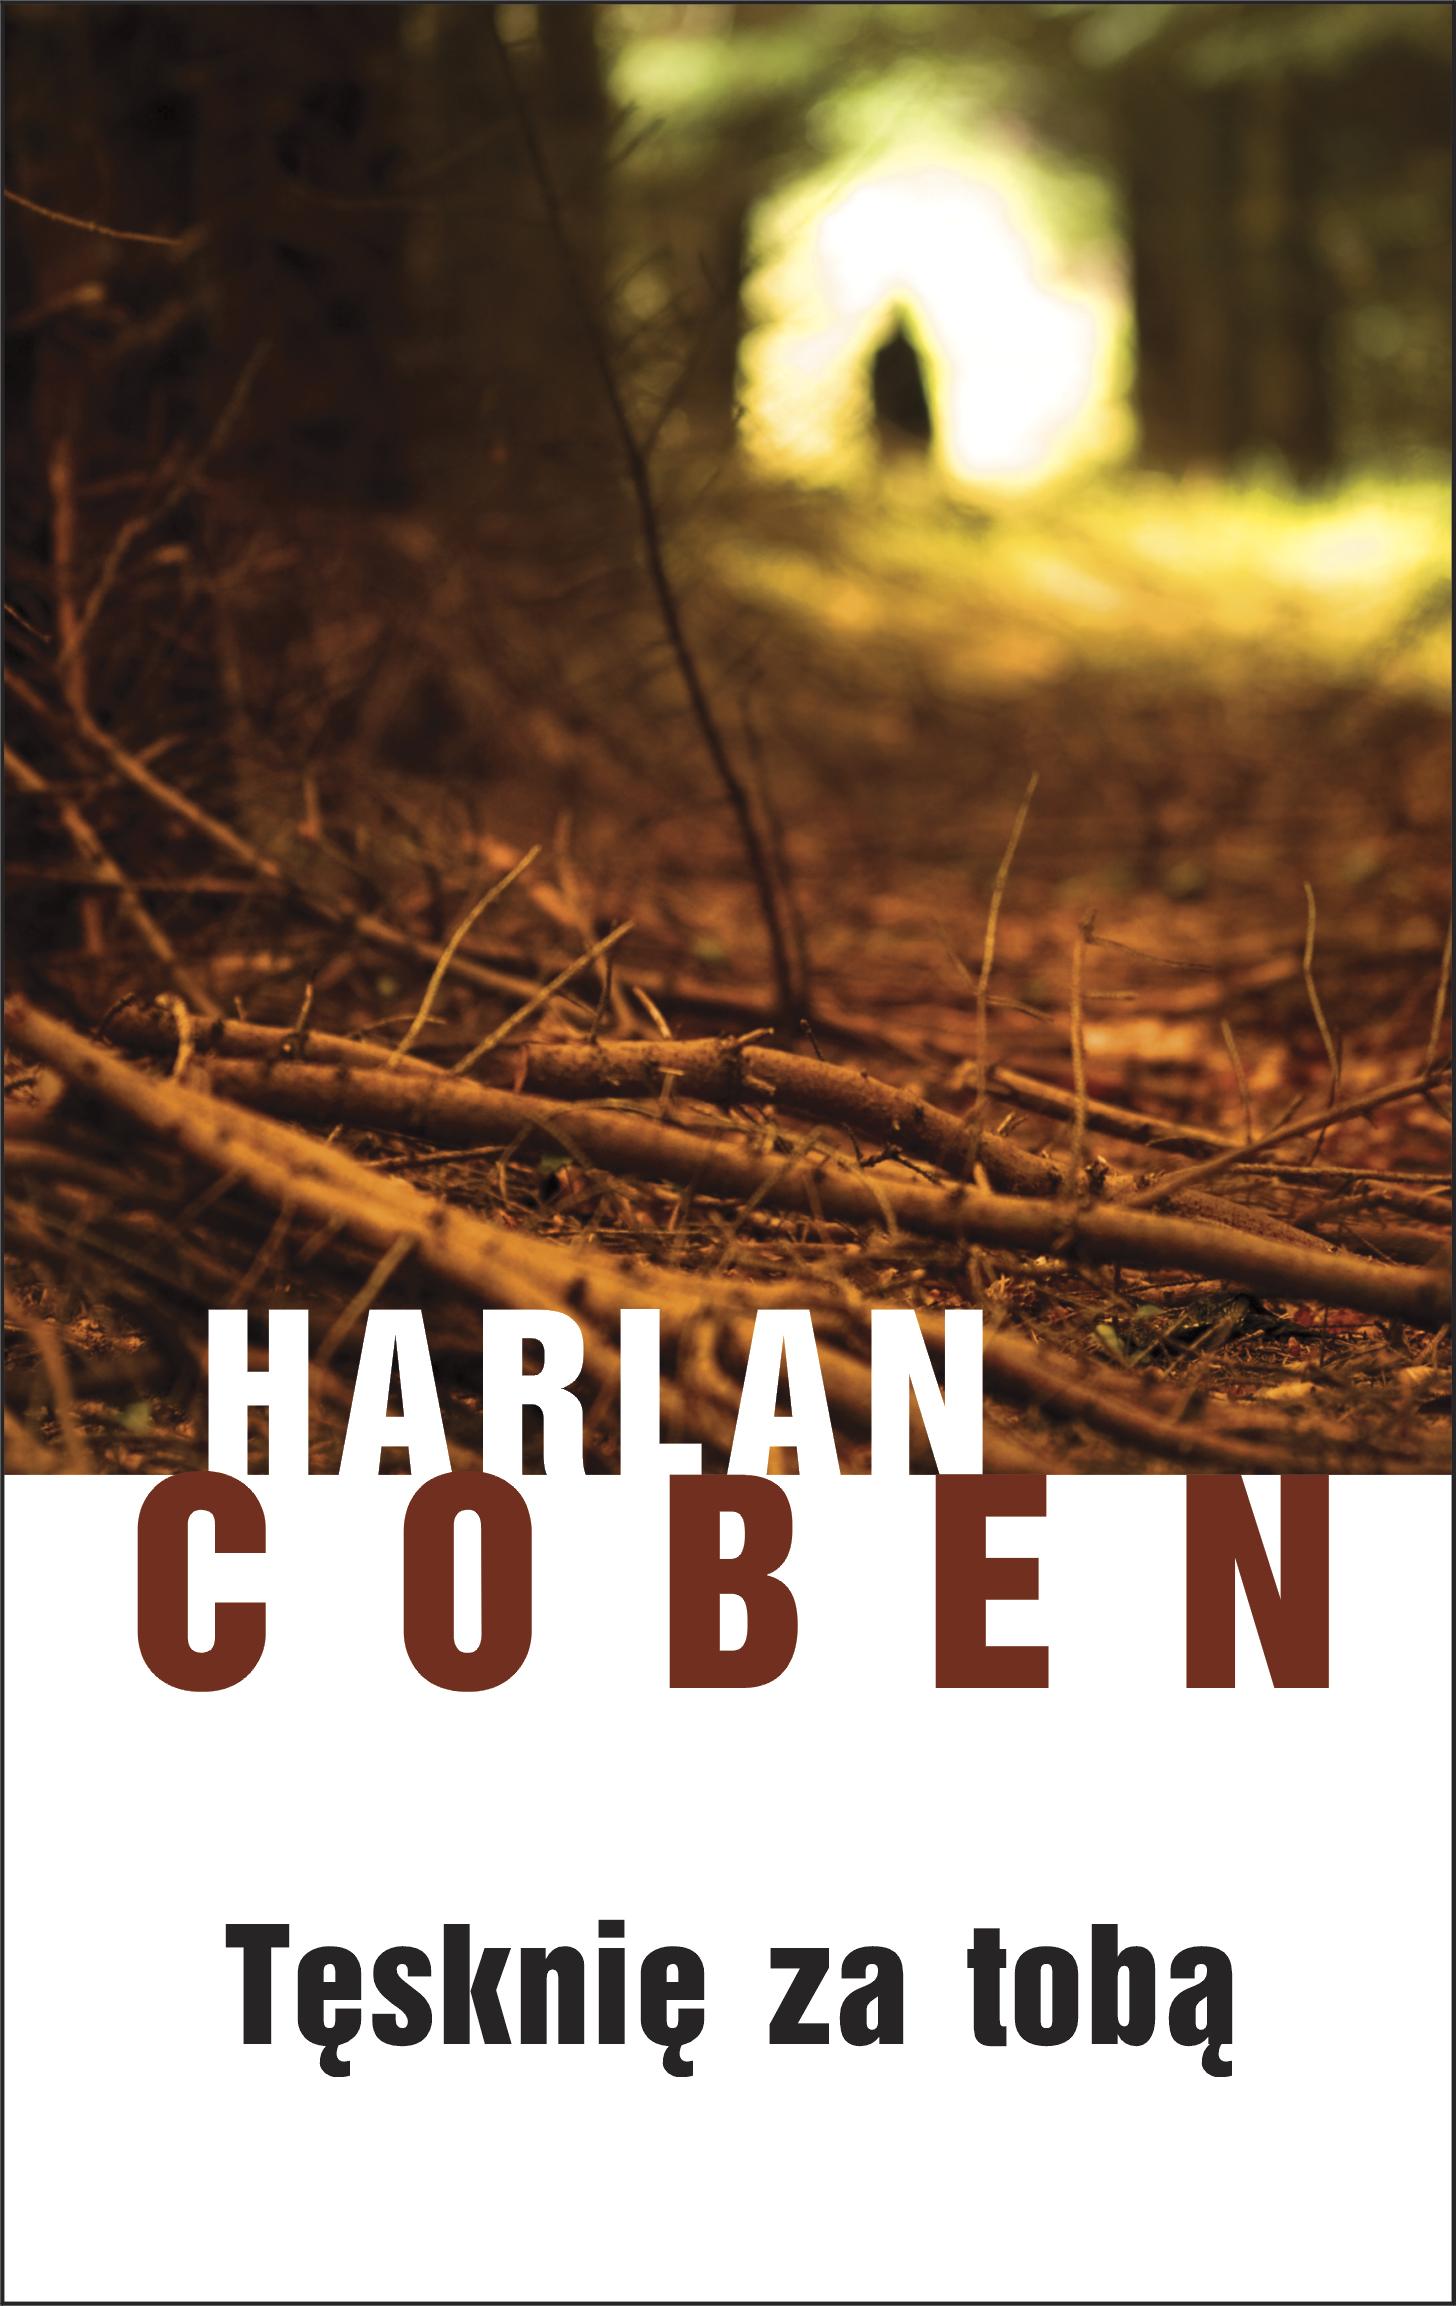 Harlan Coben, Tęsknię za tobą